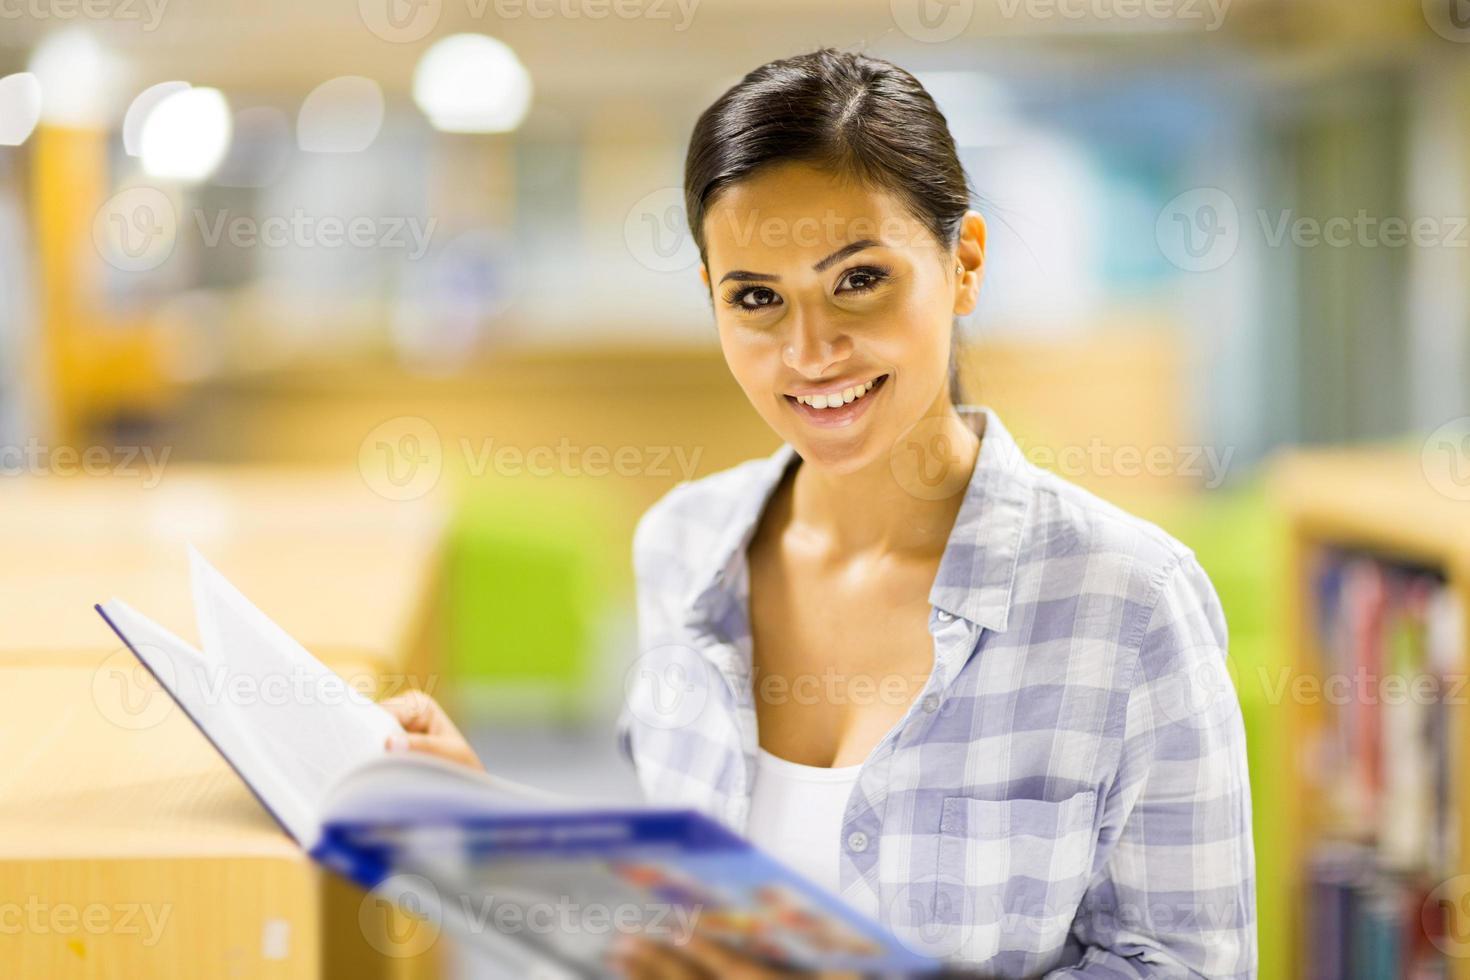 college flicka läser en bok foto